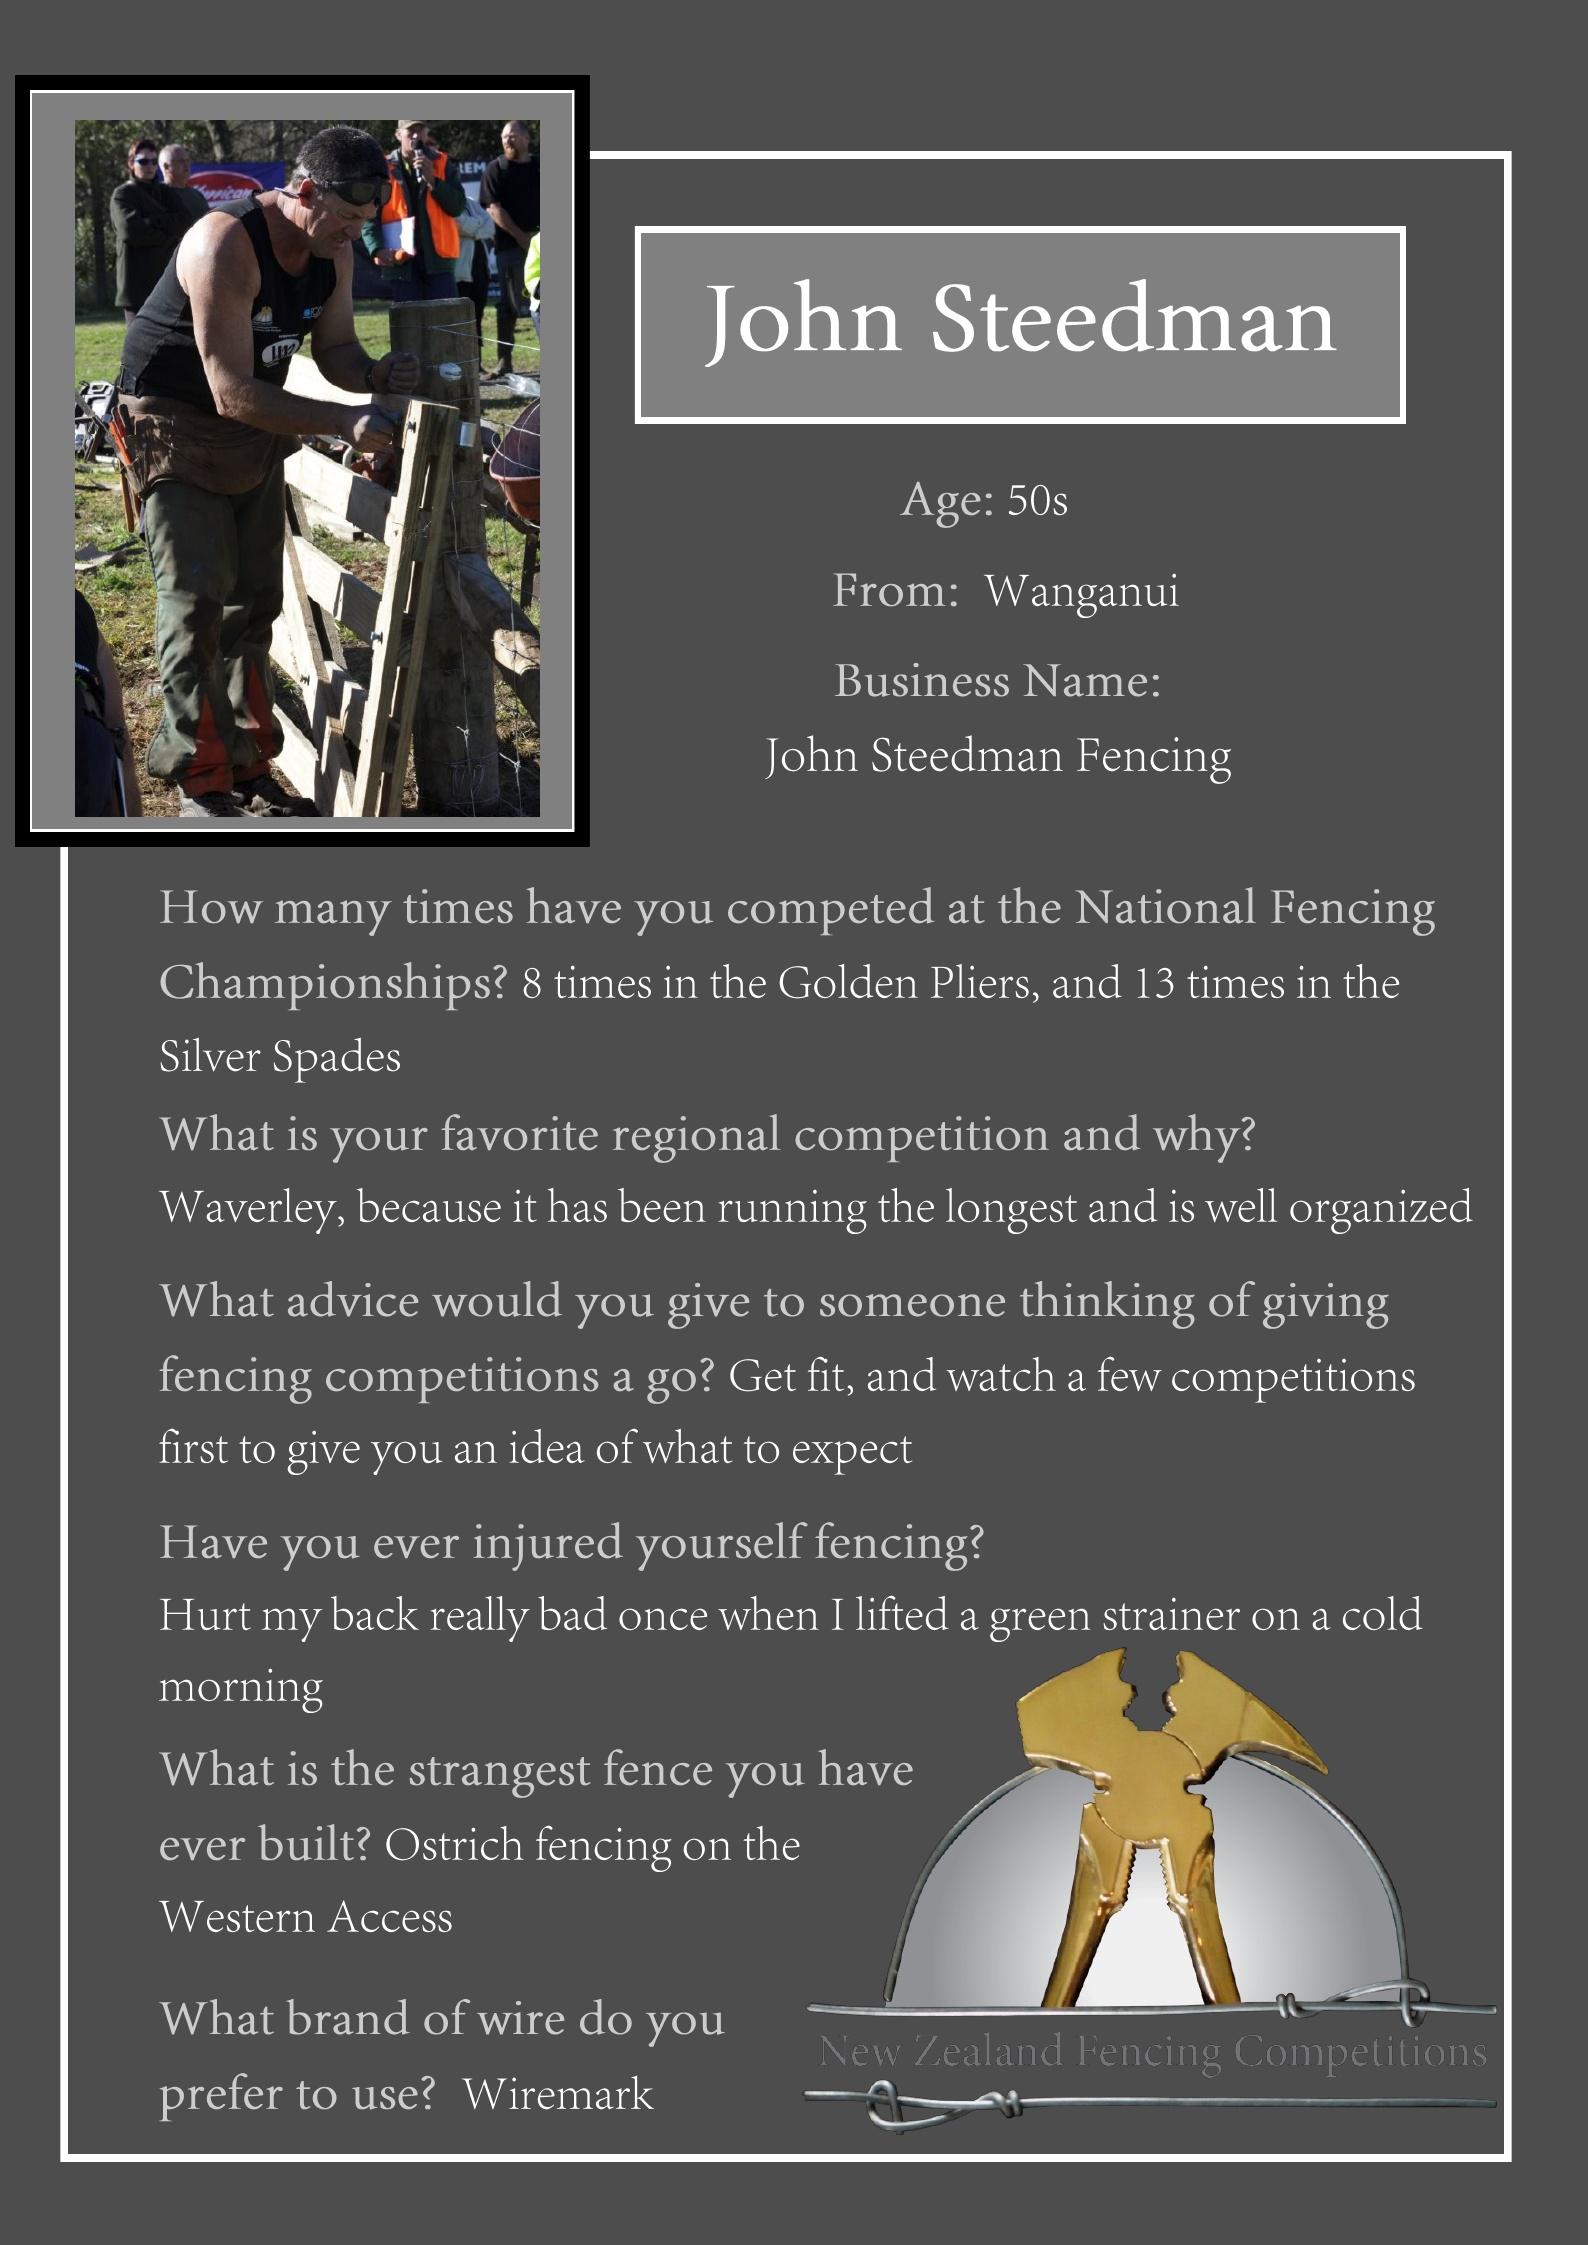 John Steedman